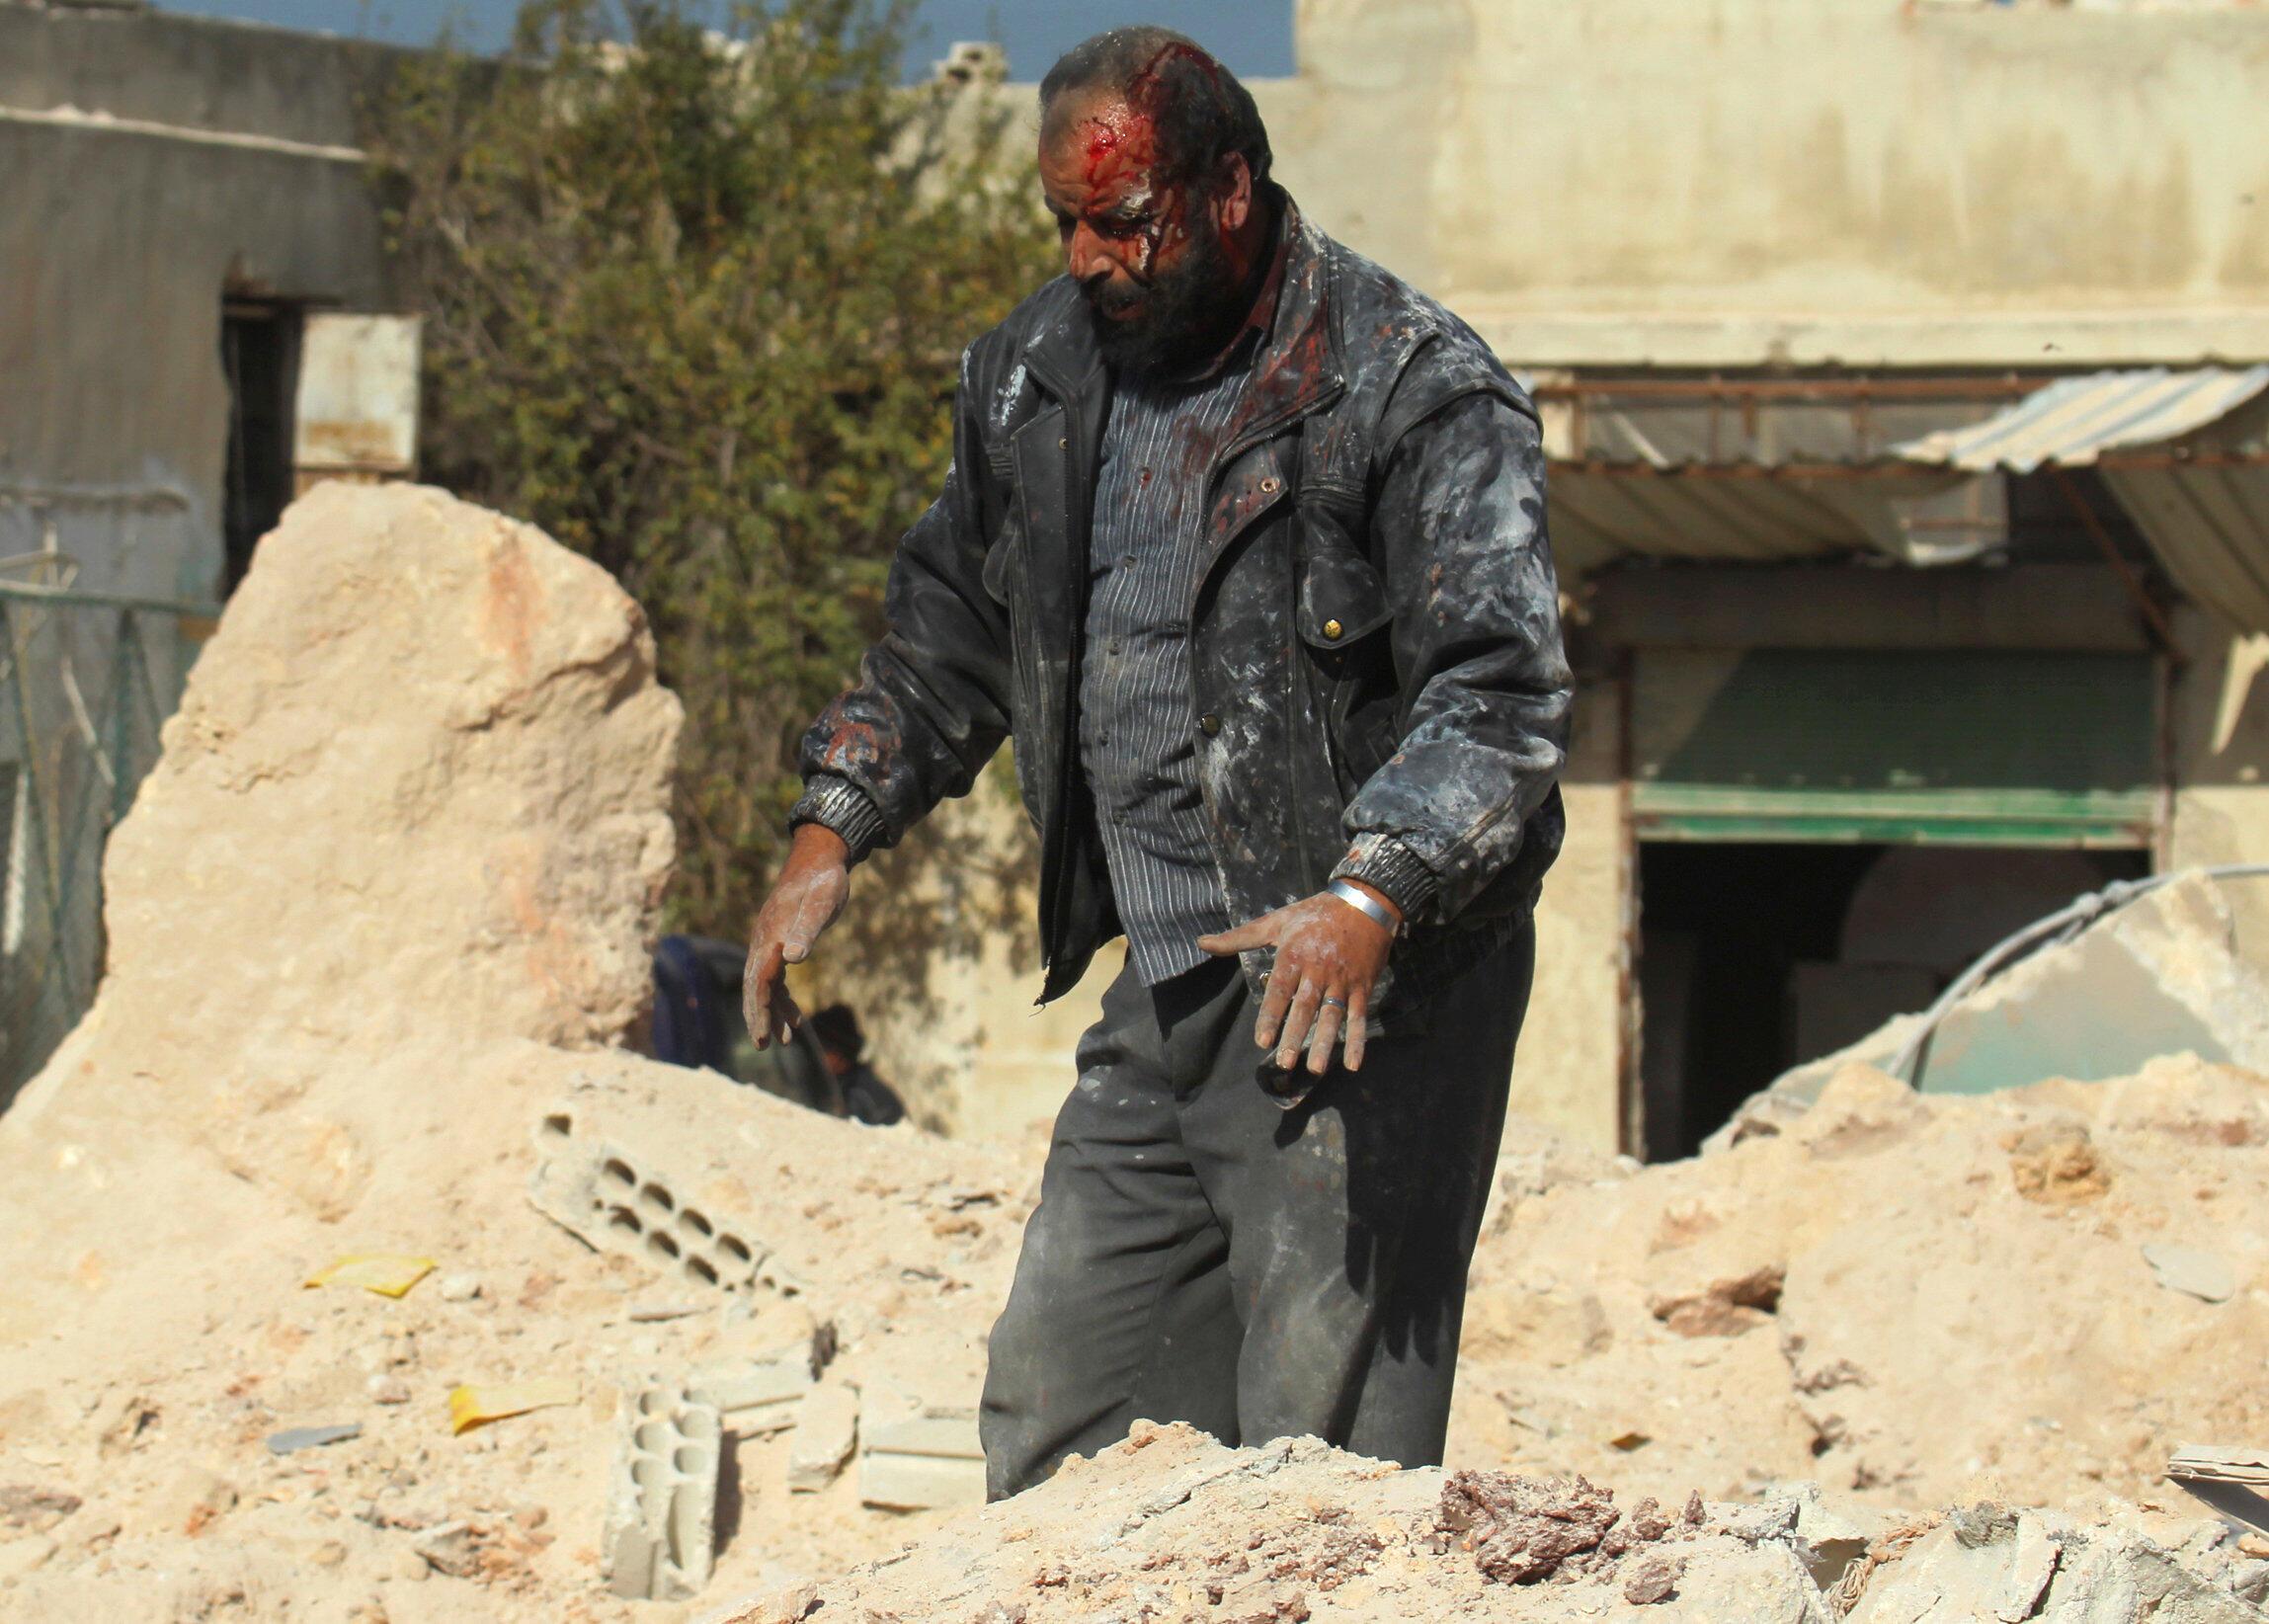 Escena de guerra en Idlib, Siria, 20 de noviembre de 2016.